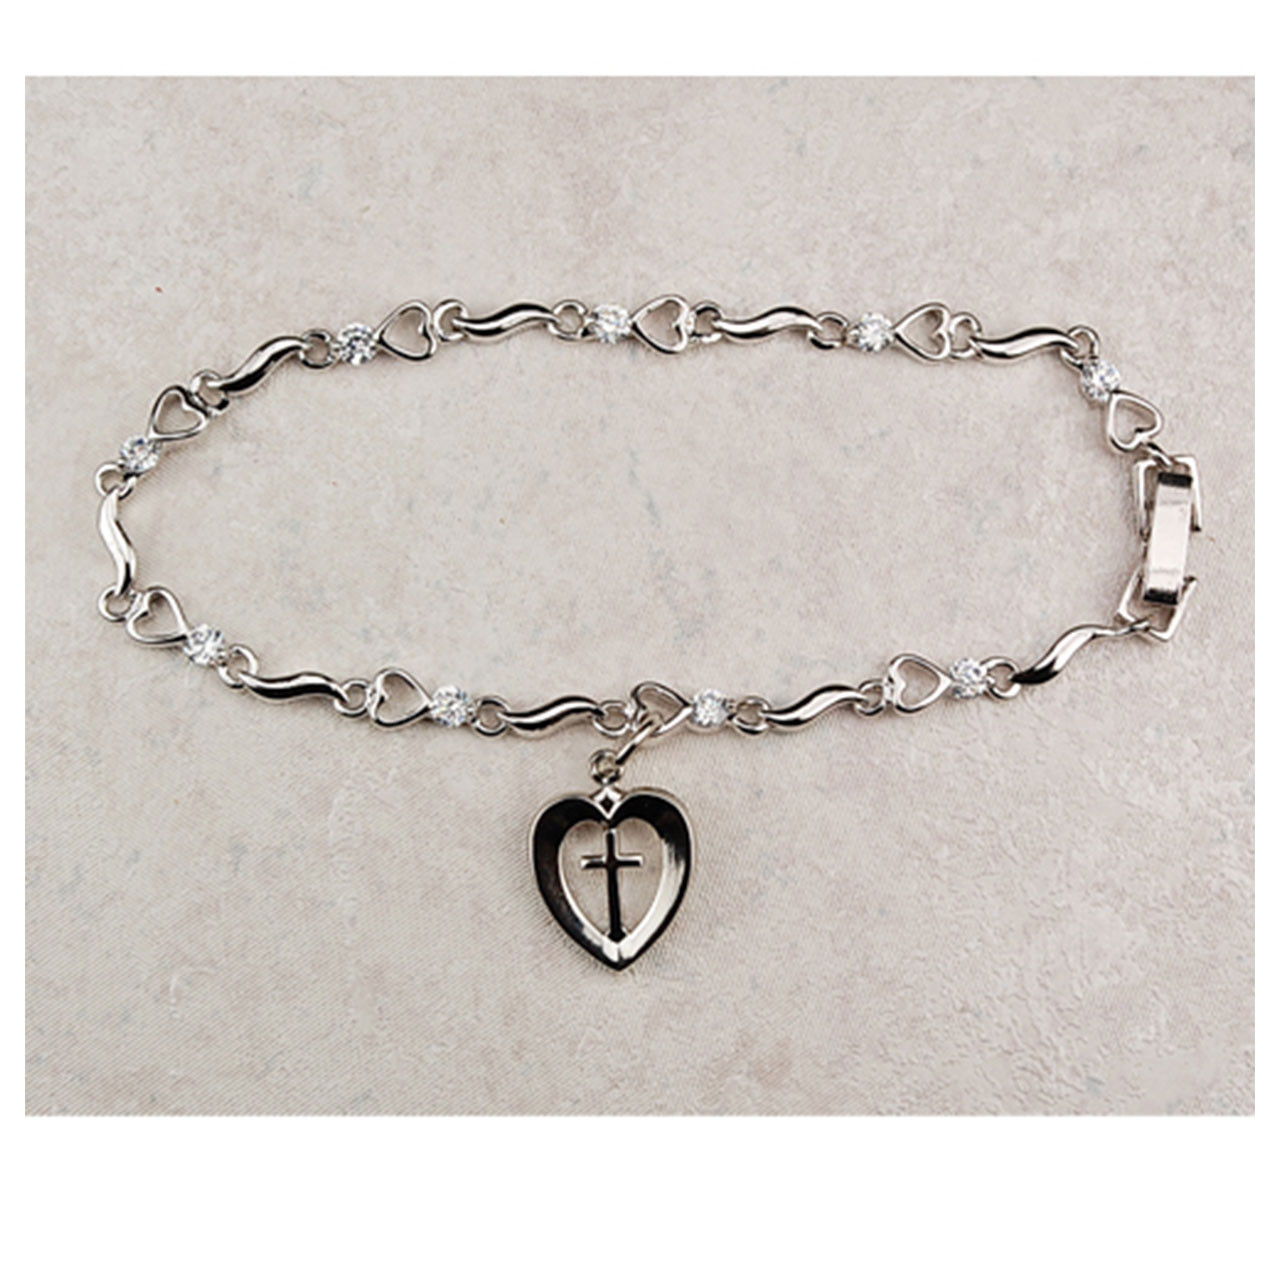 Heart with Cross Religious Bracelet